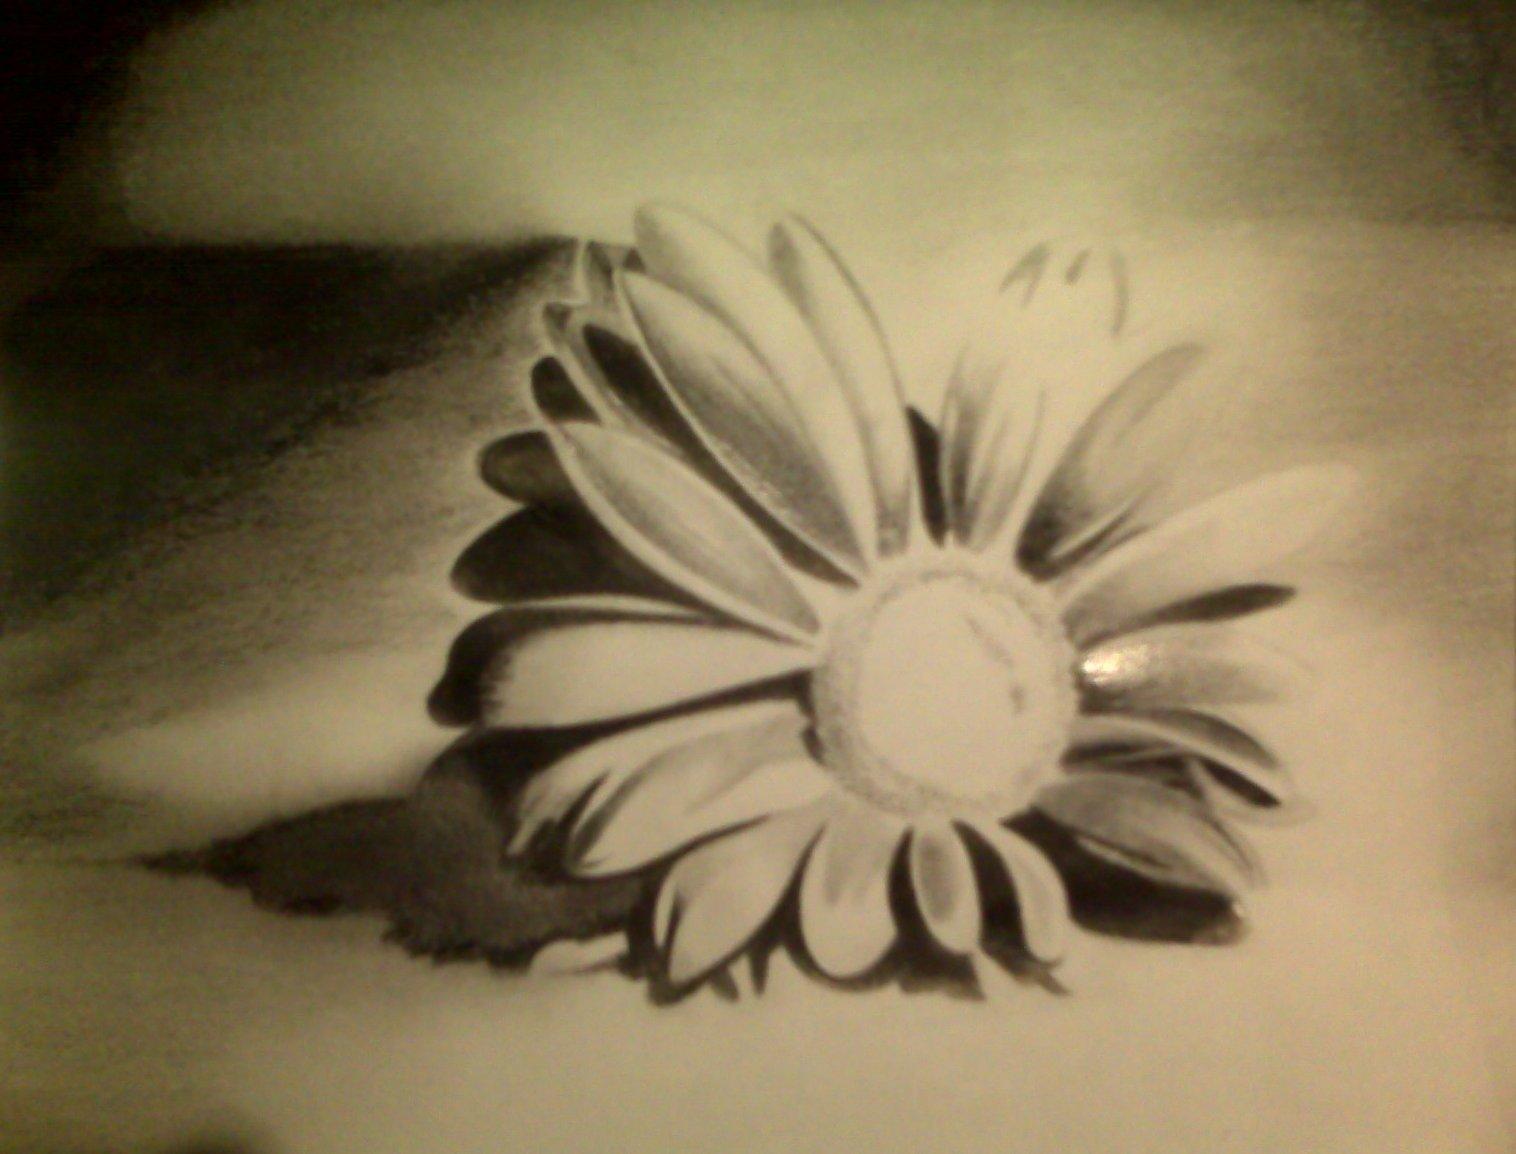 Chloe's Flower - Pencil Sketch